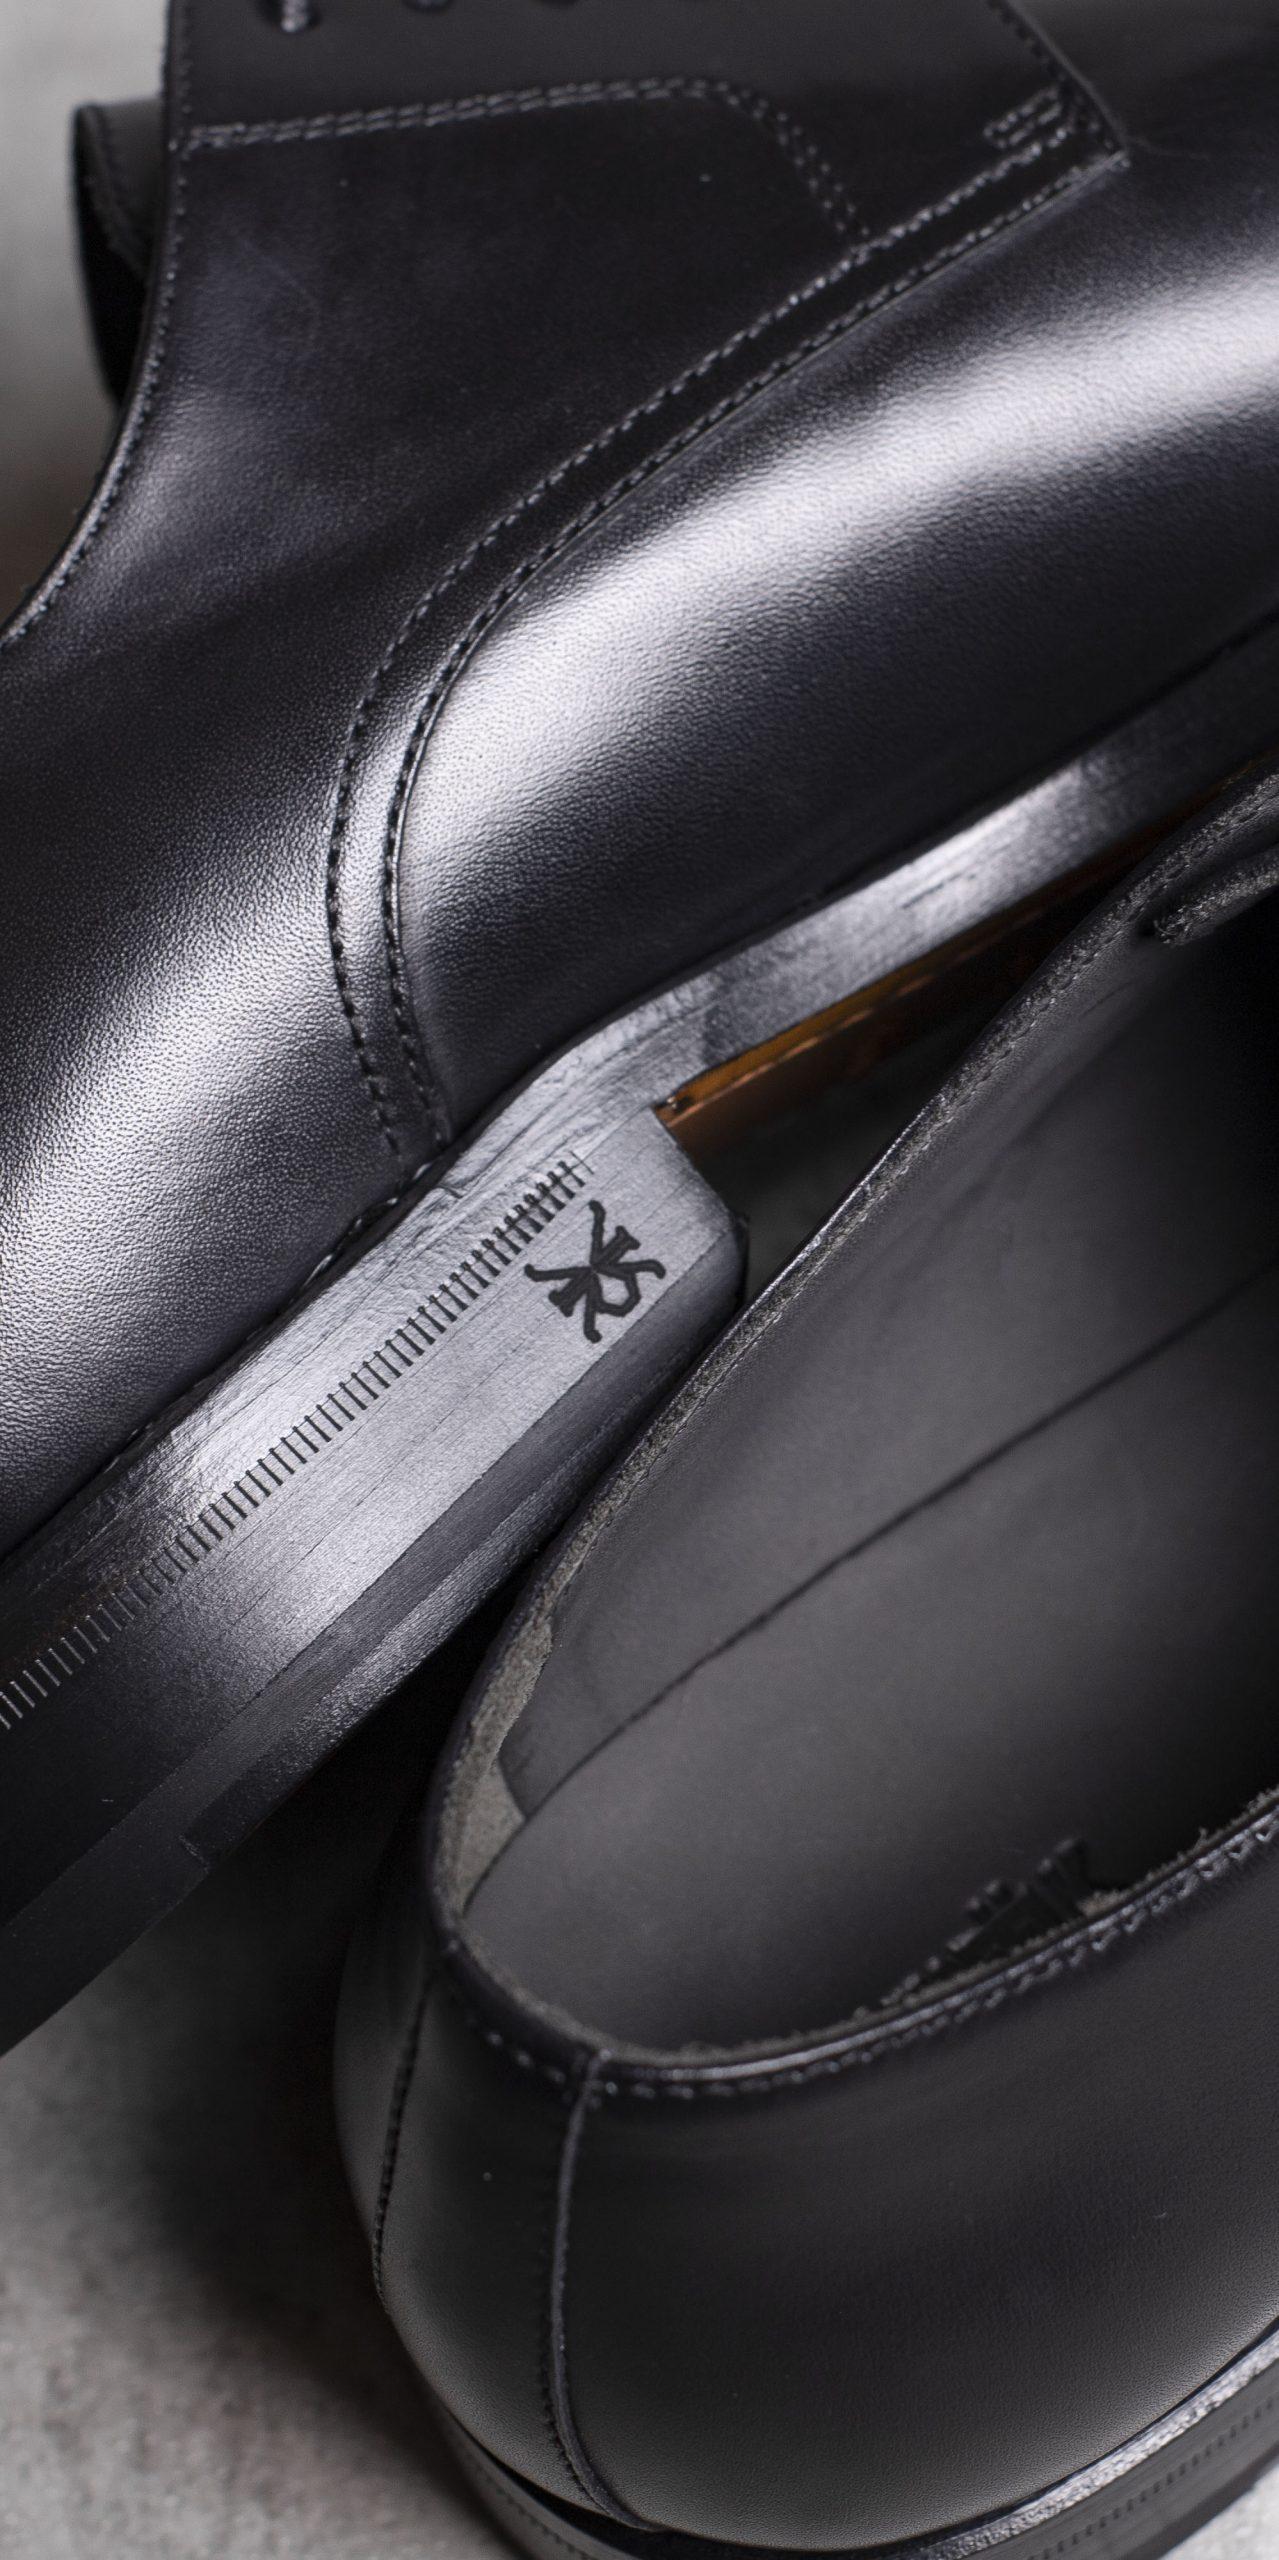 DERBY · 0649 Black leather The Seëlk 7